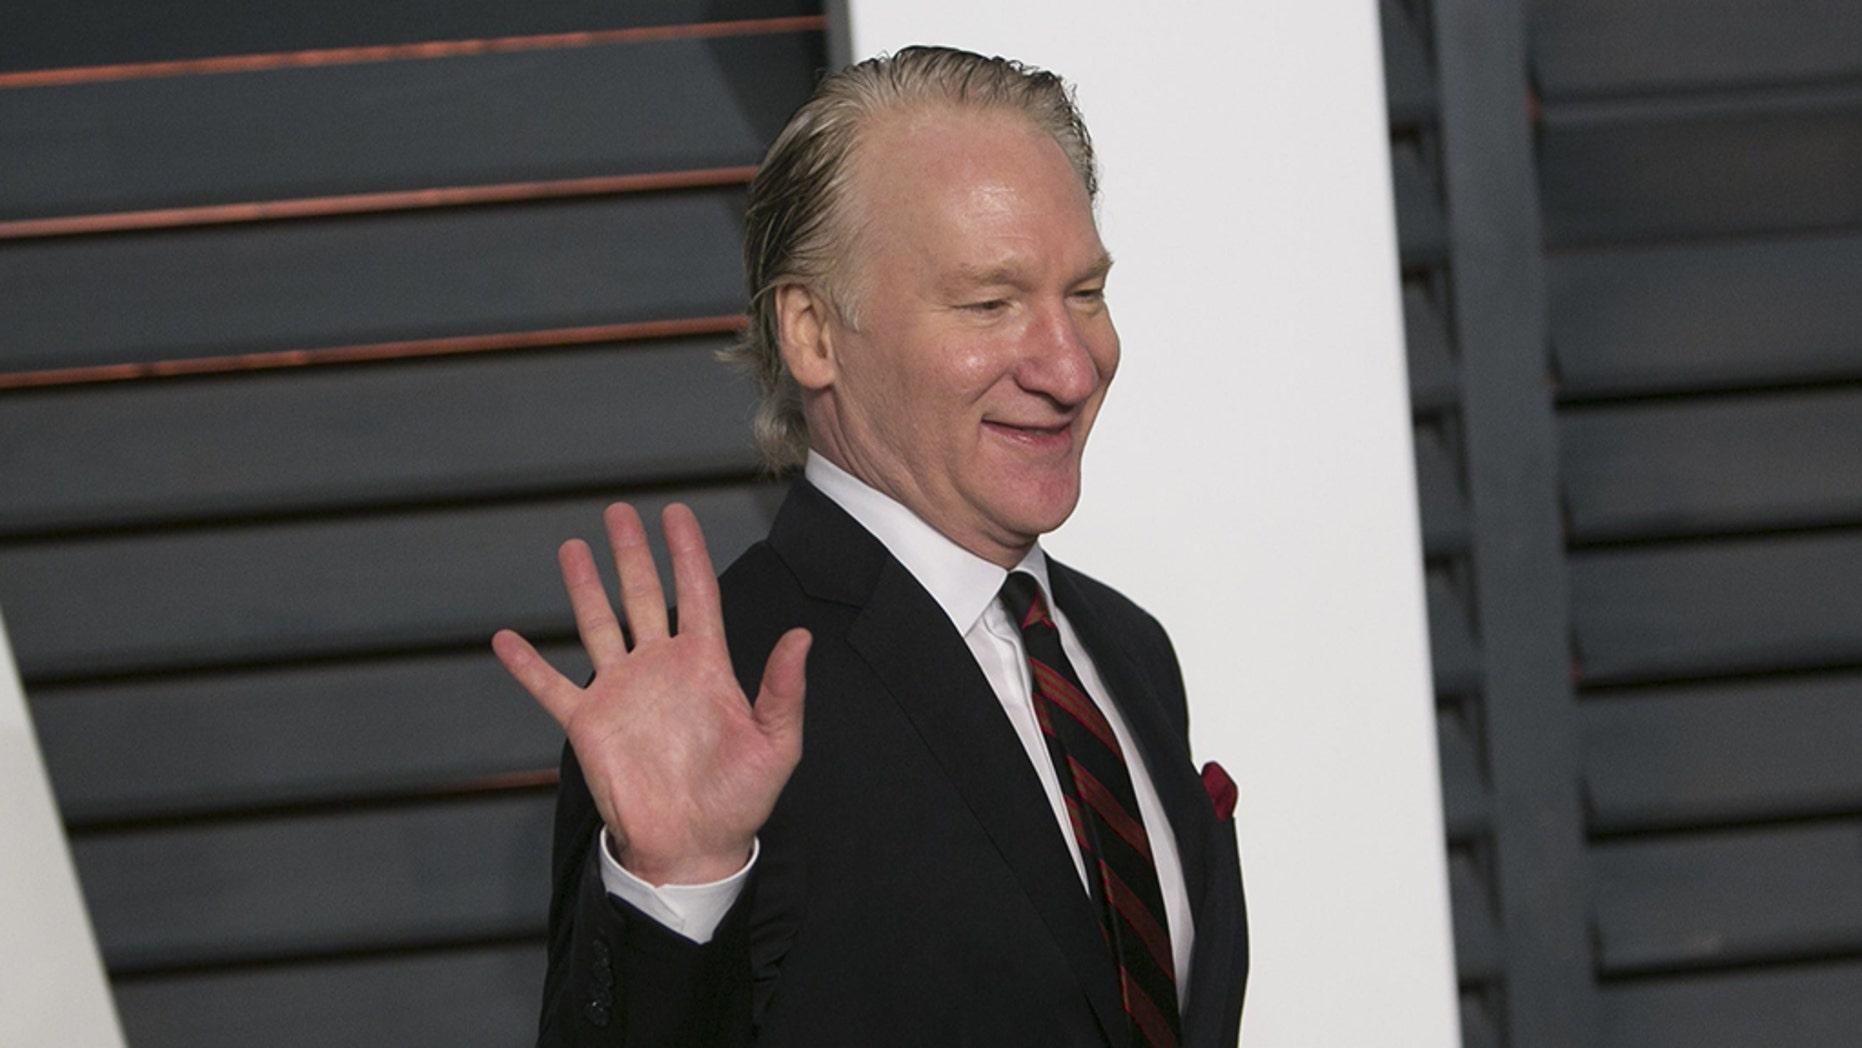 Bill Maher arrives atthe 2015 Vanity Fair Oscar Party in Beverly Hills, California. (ADRIAN SANCHEZ-GONZALEZ/AFP/Getty Images)